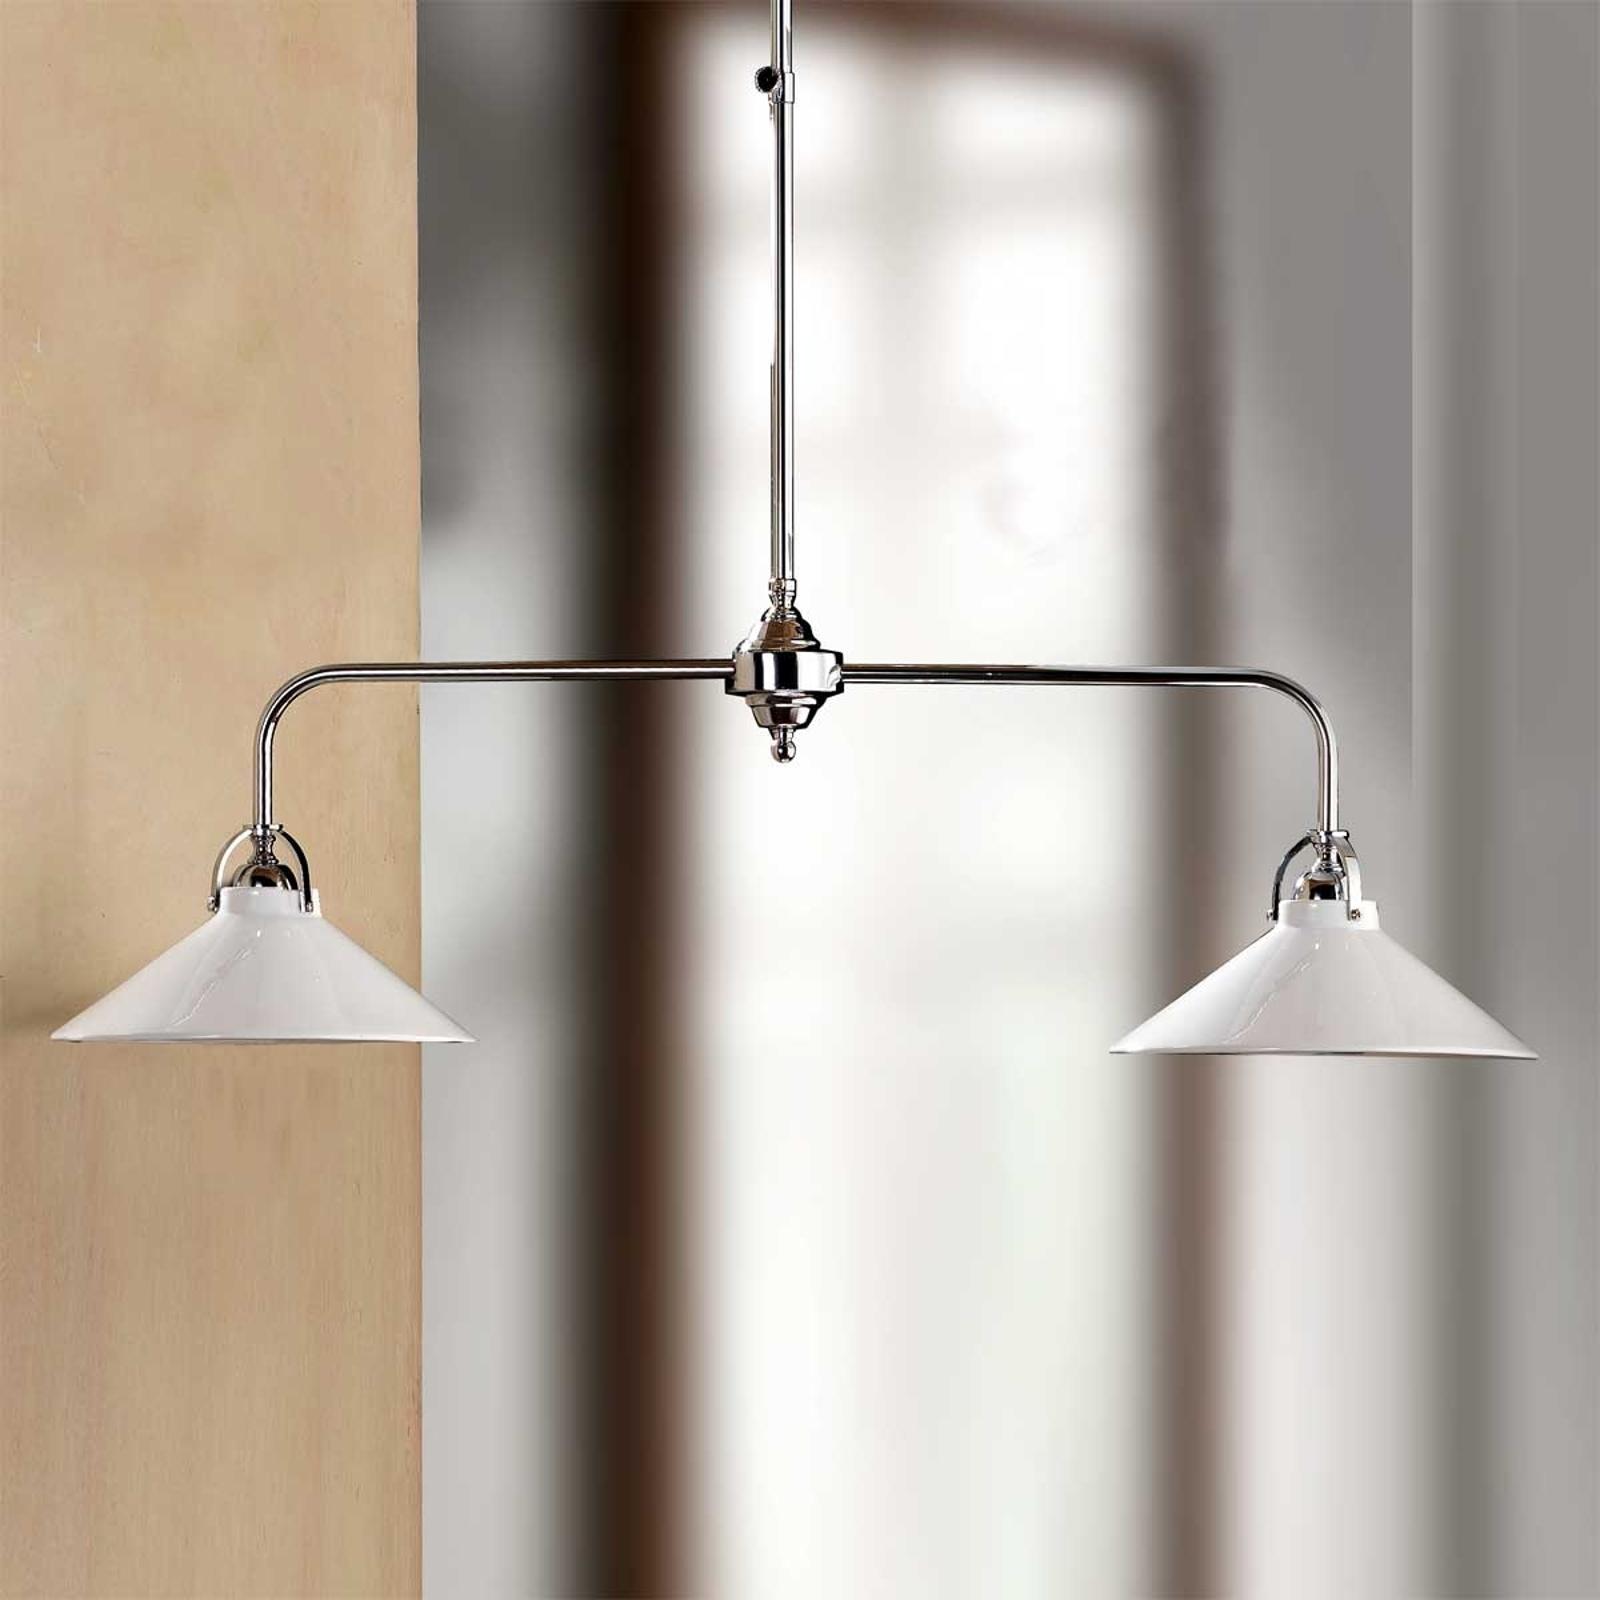 Závesná lampa GIACOMO keramické tienidlá 2-pl._2013093_1